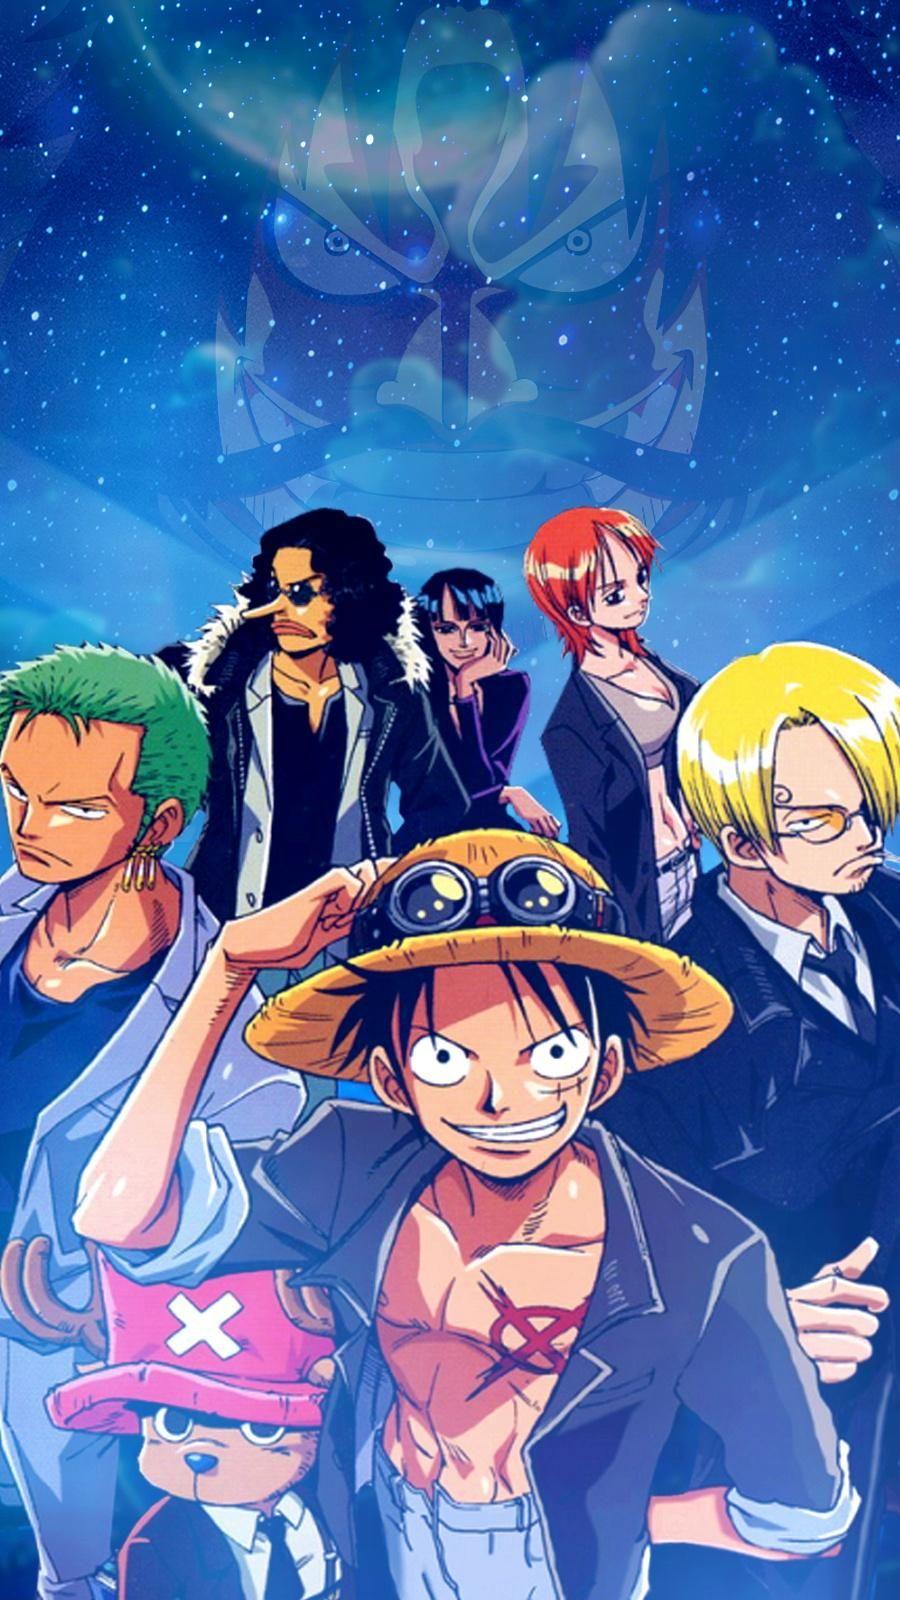 One Piece Mobile Wallpaper Reddit Bakaninime In 2021 Mobile Wallpaper Popular Anime Anime Anime phone wallpapers reddit